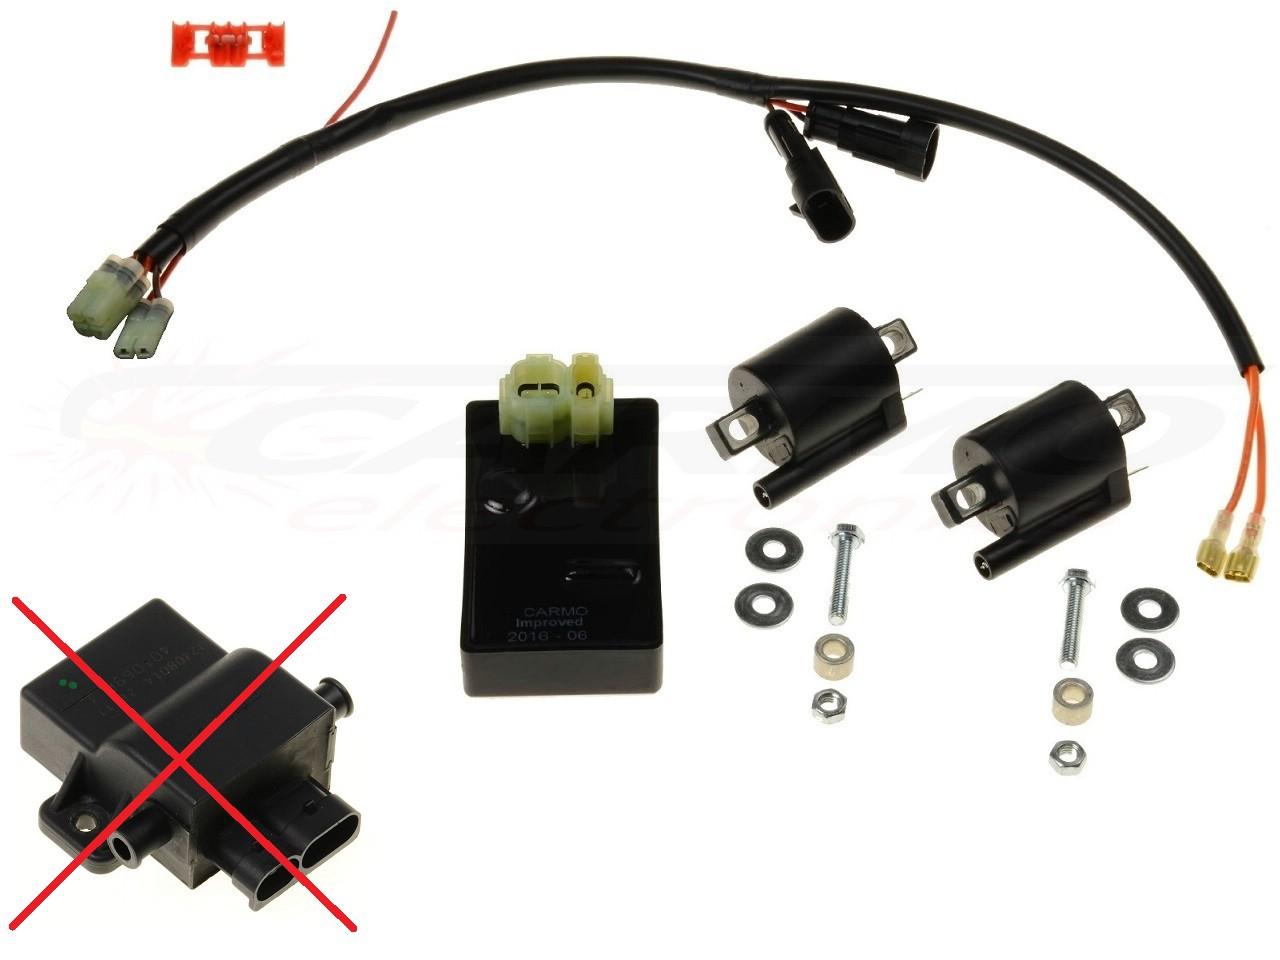 ford sierra wiper wiring diagram 3 wire thermostat heat only f800 parts online auto